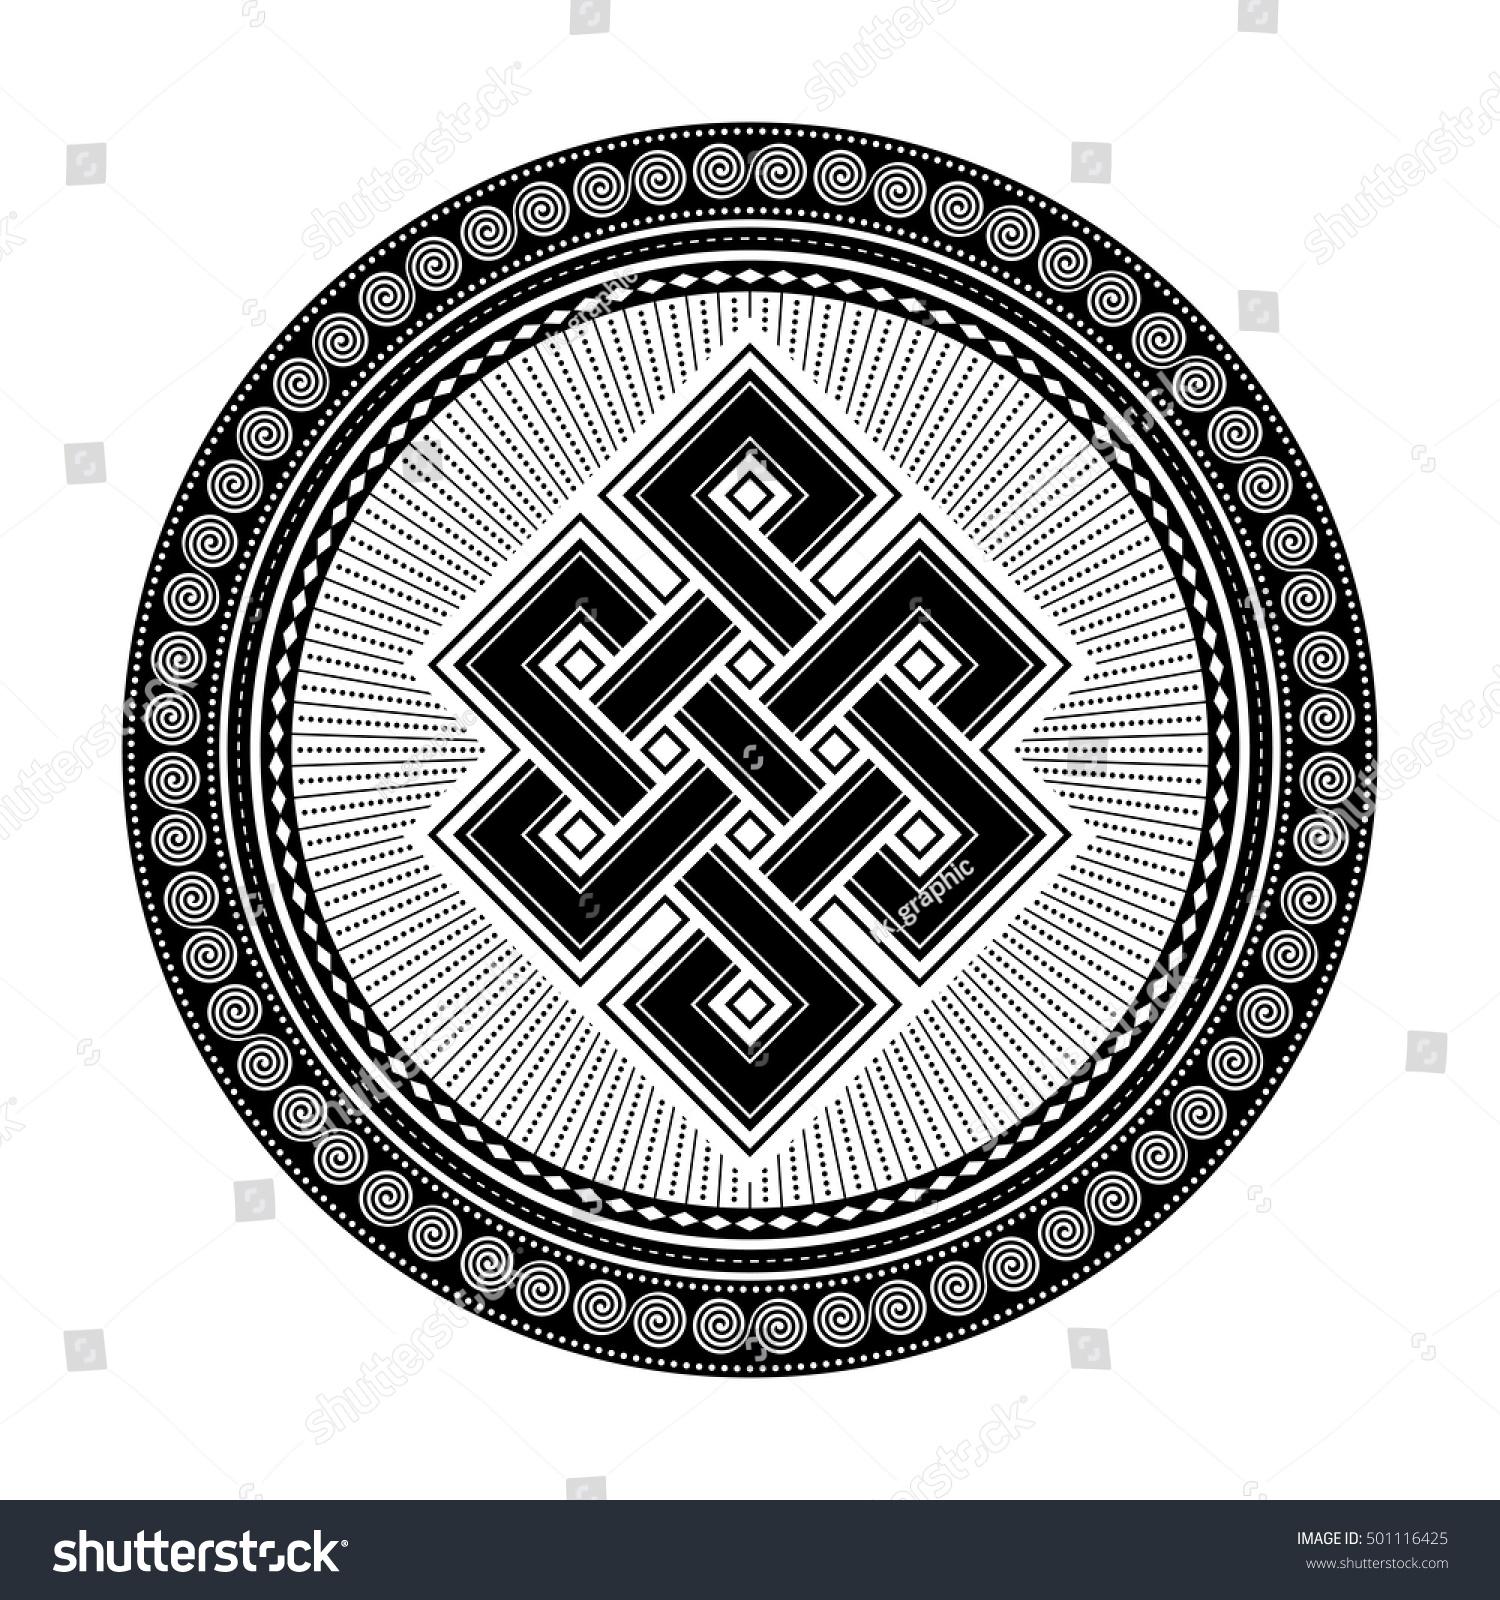 Endless Knot Black White Vector Illustration Stock Vector Royalty